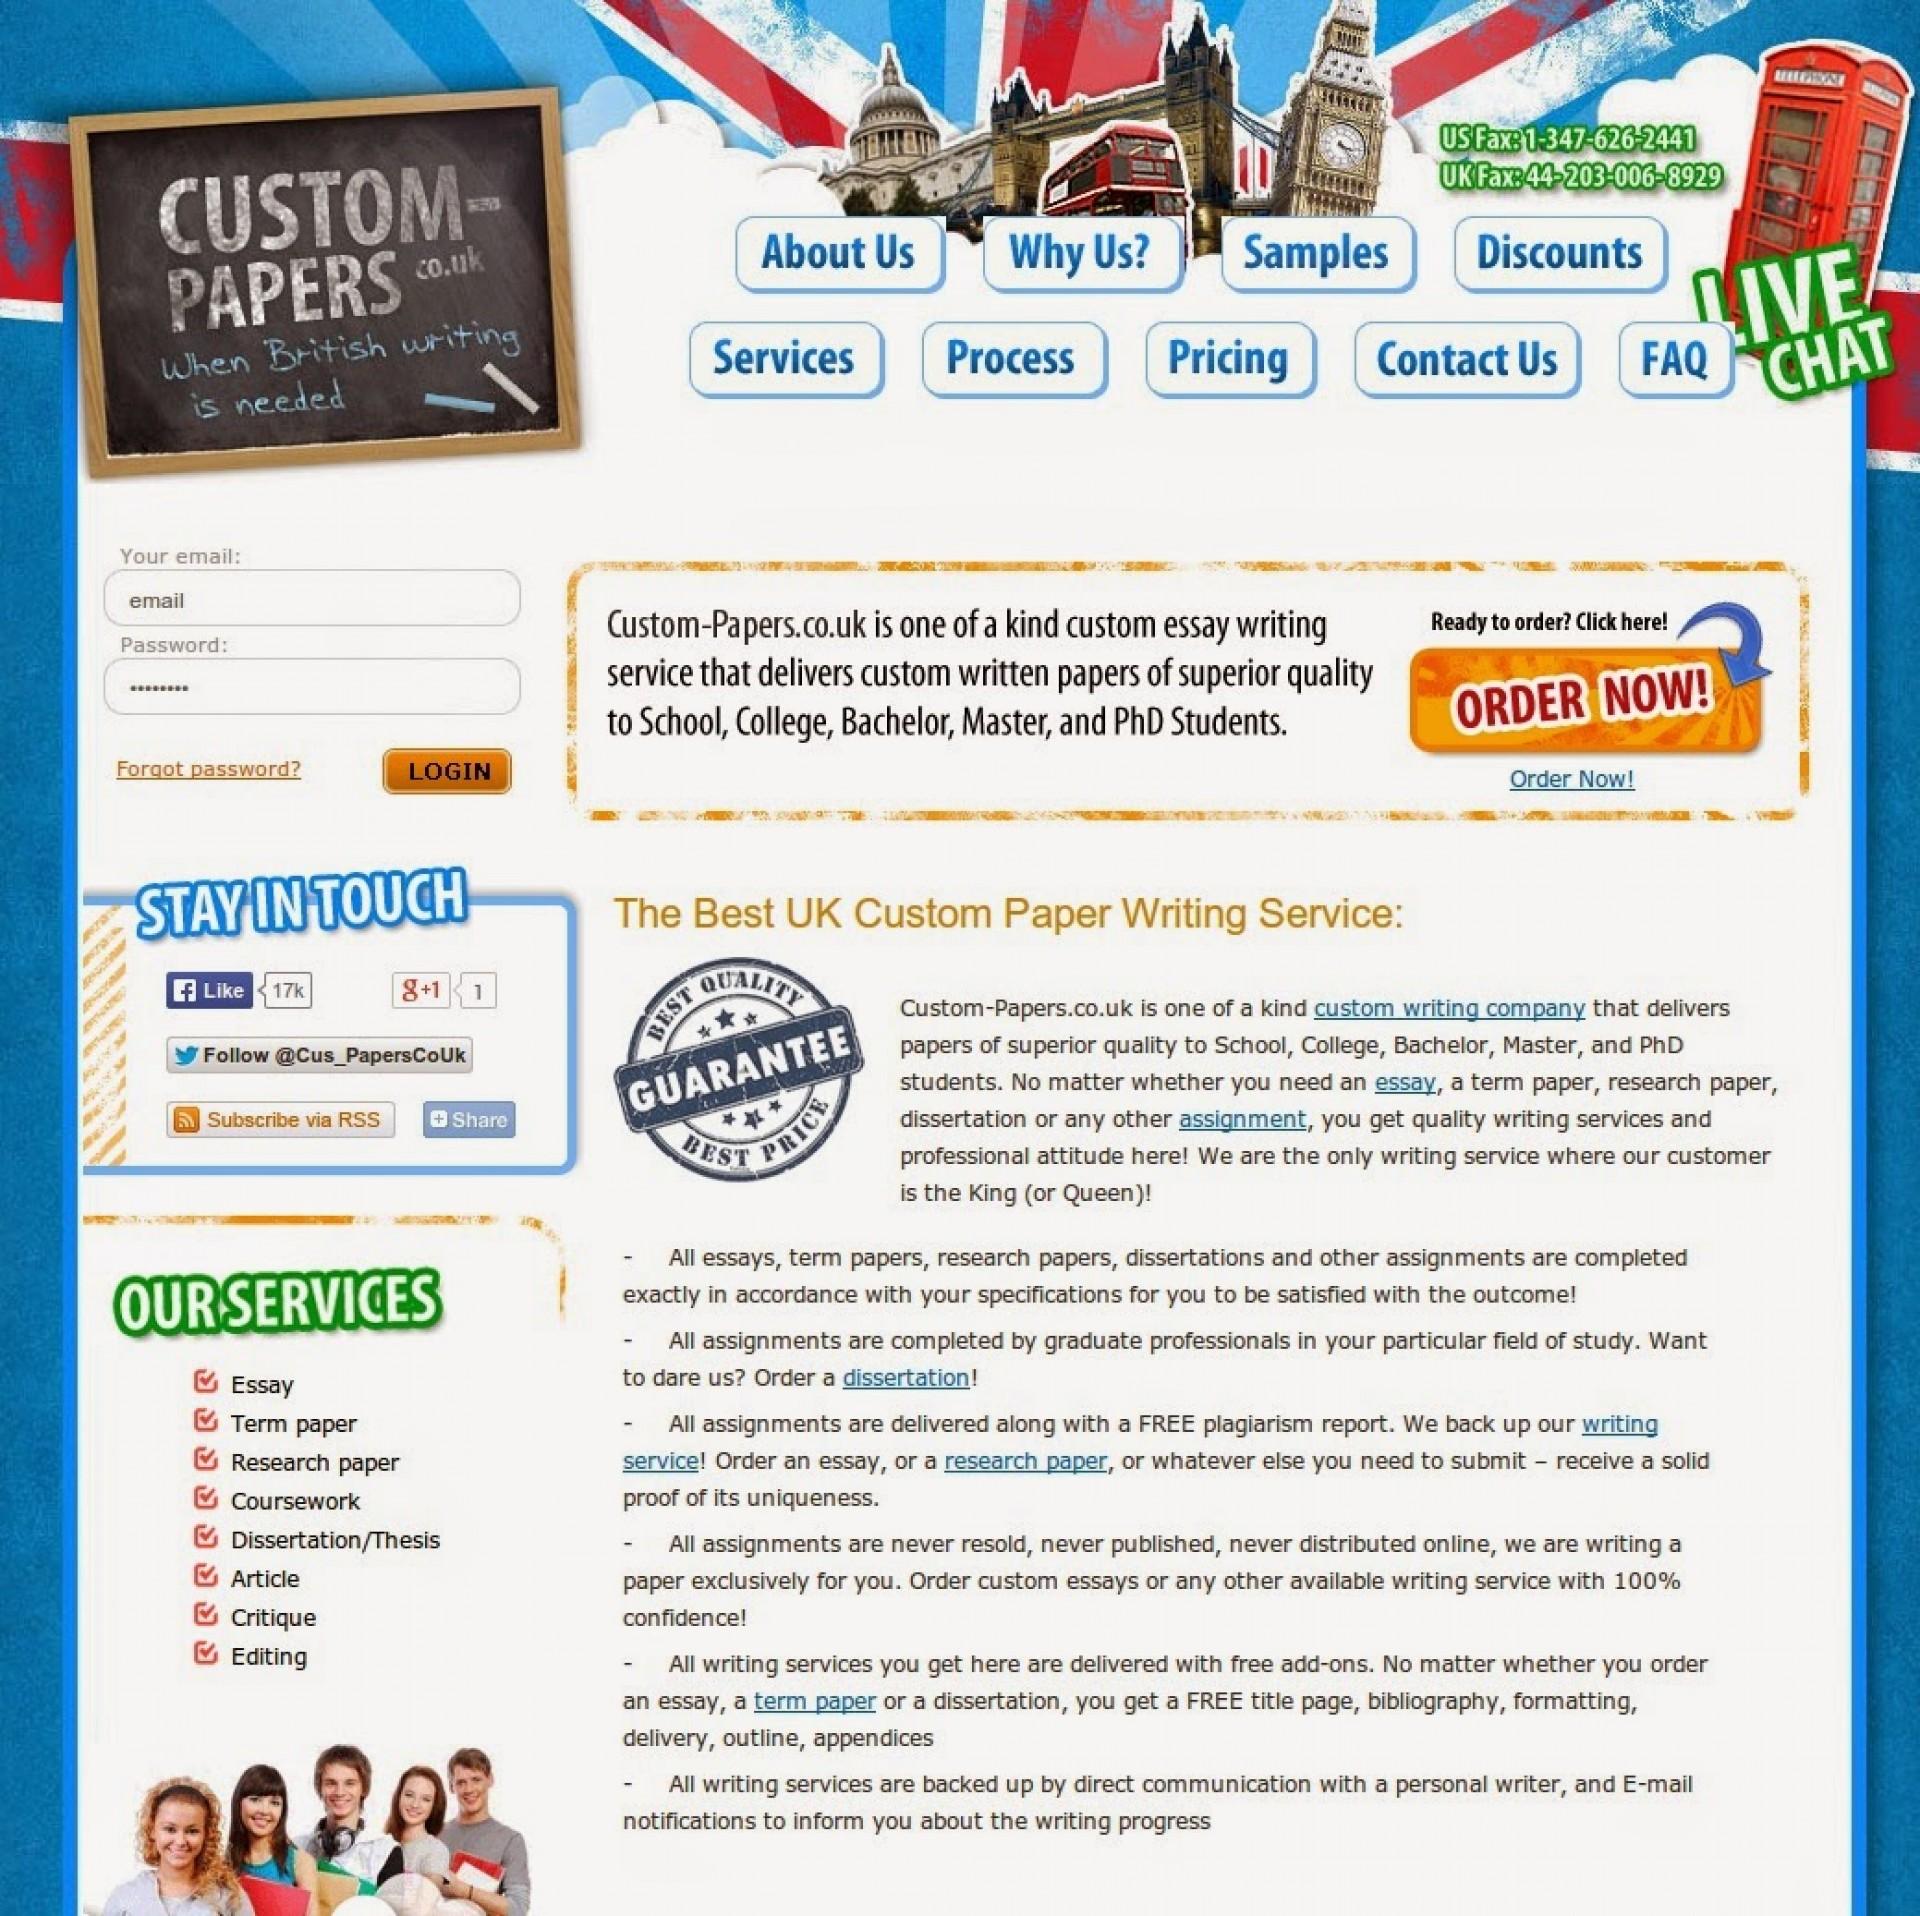 017 Essay Writing Companies Uk Top Custom Website Usa Websites Sites 1920